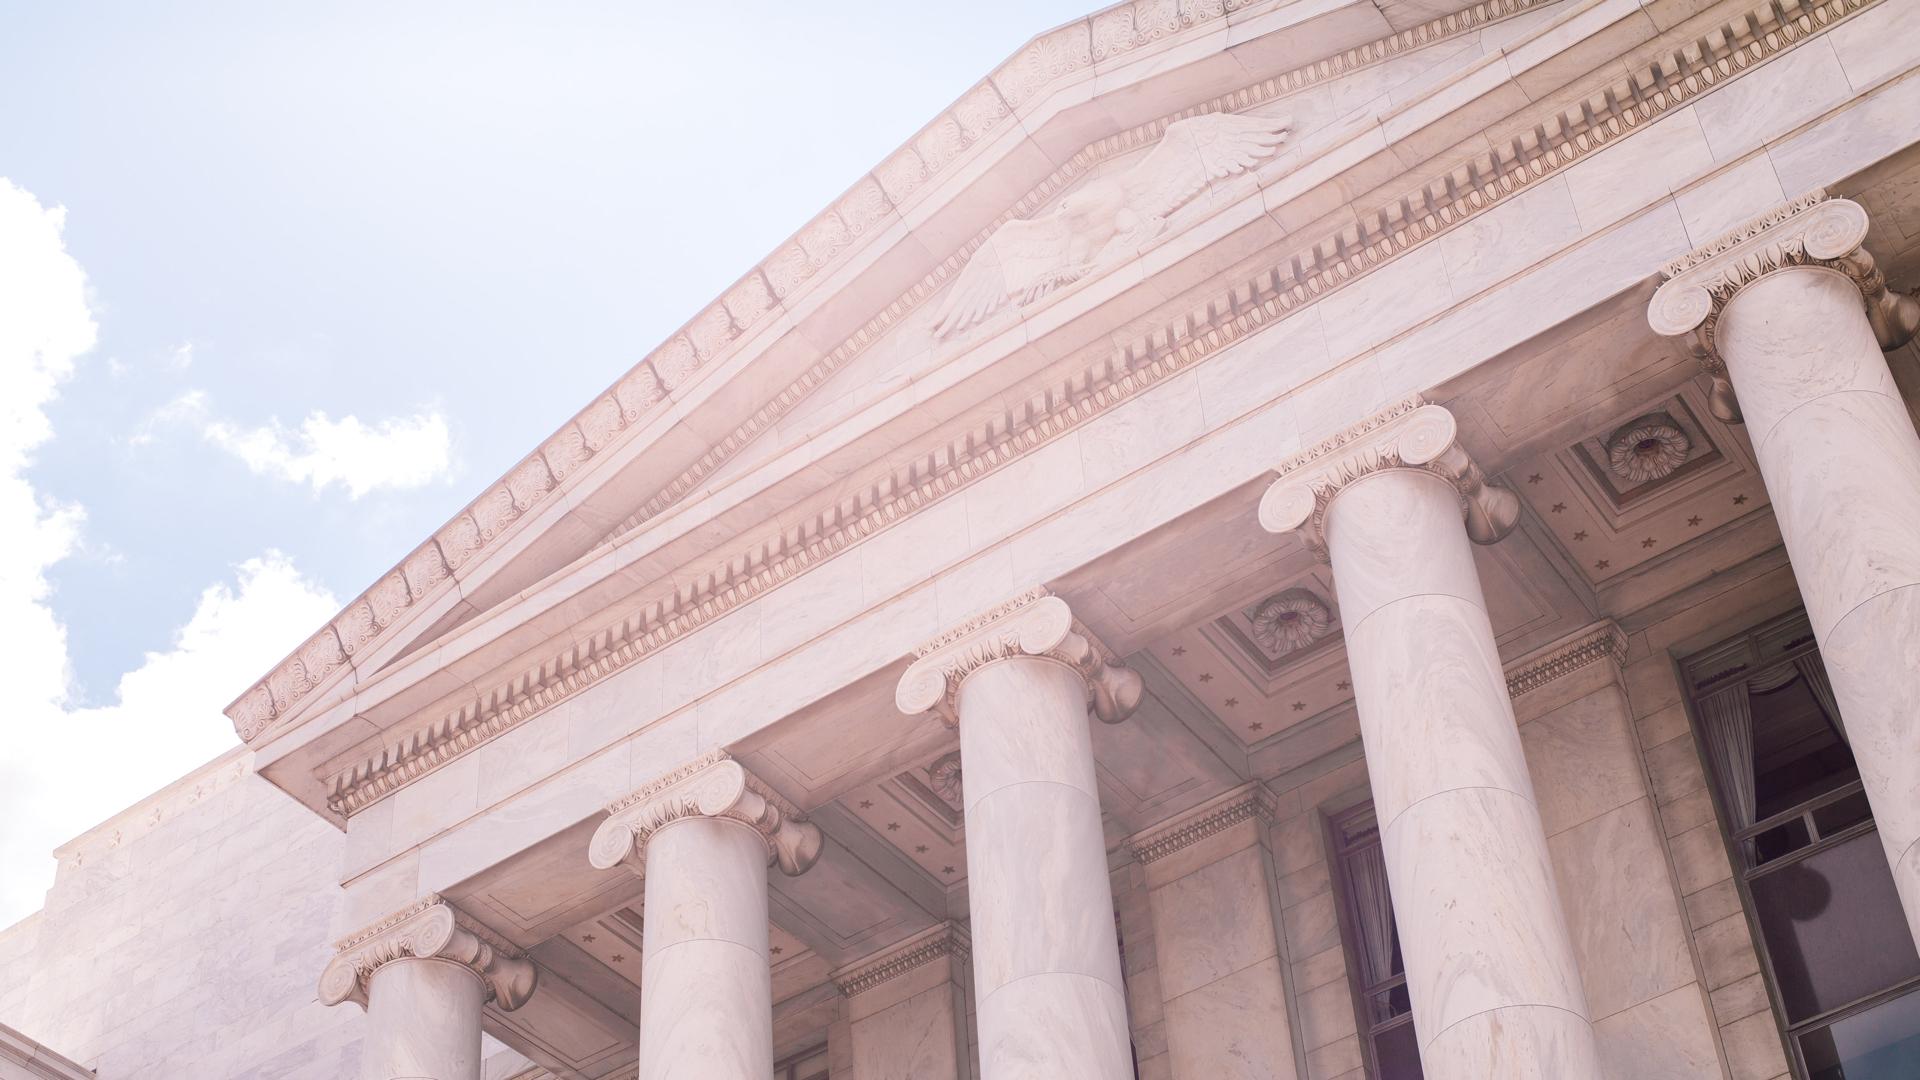 Democratizing Data Through a National Research Cloud